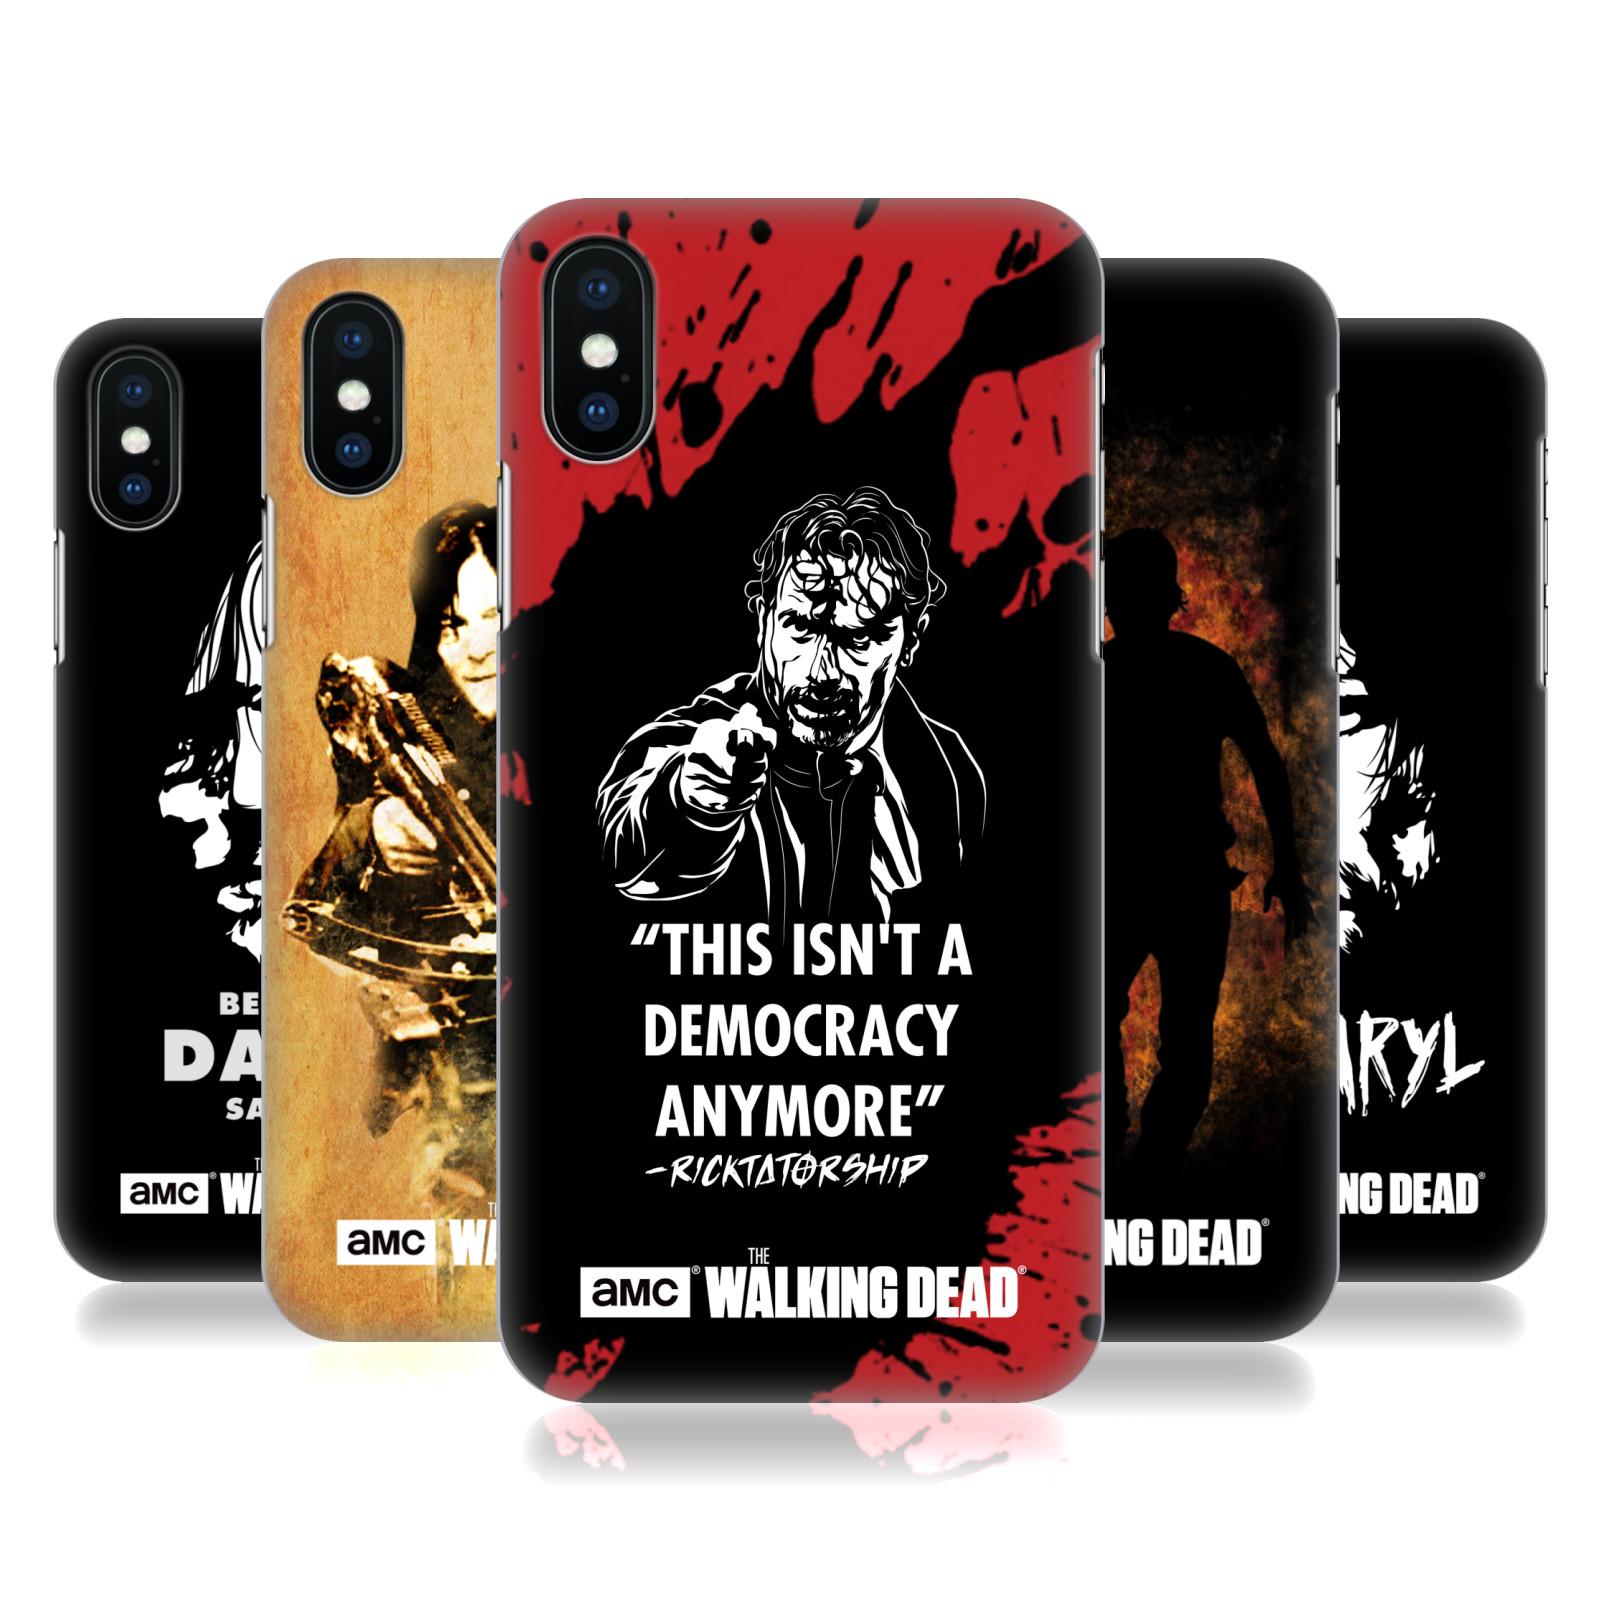 AMC The Walking Dead Typography